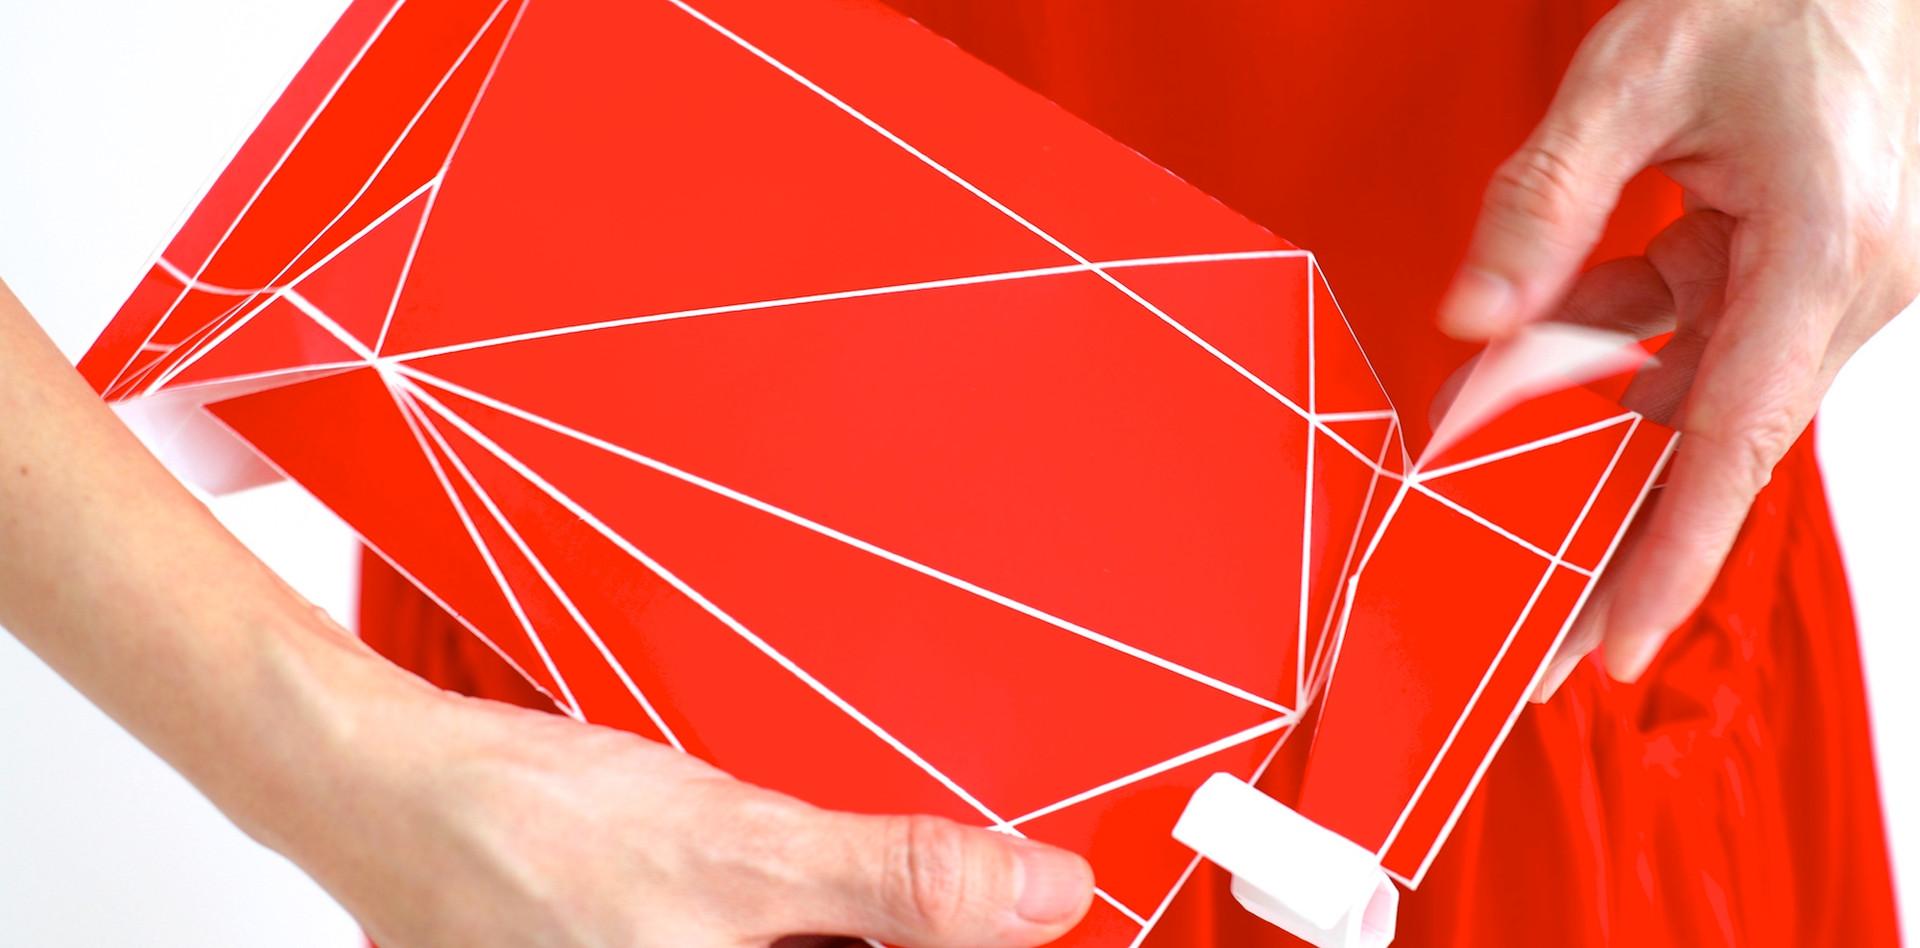 Step 5 PLIC PACK N°001 VACHE